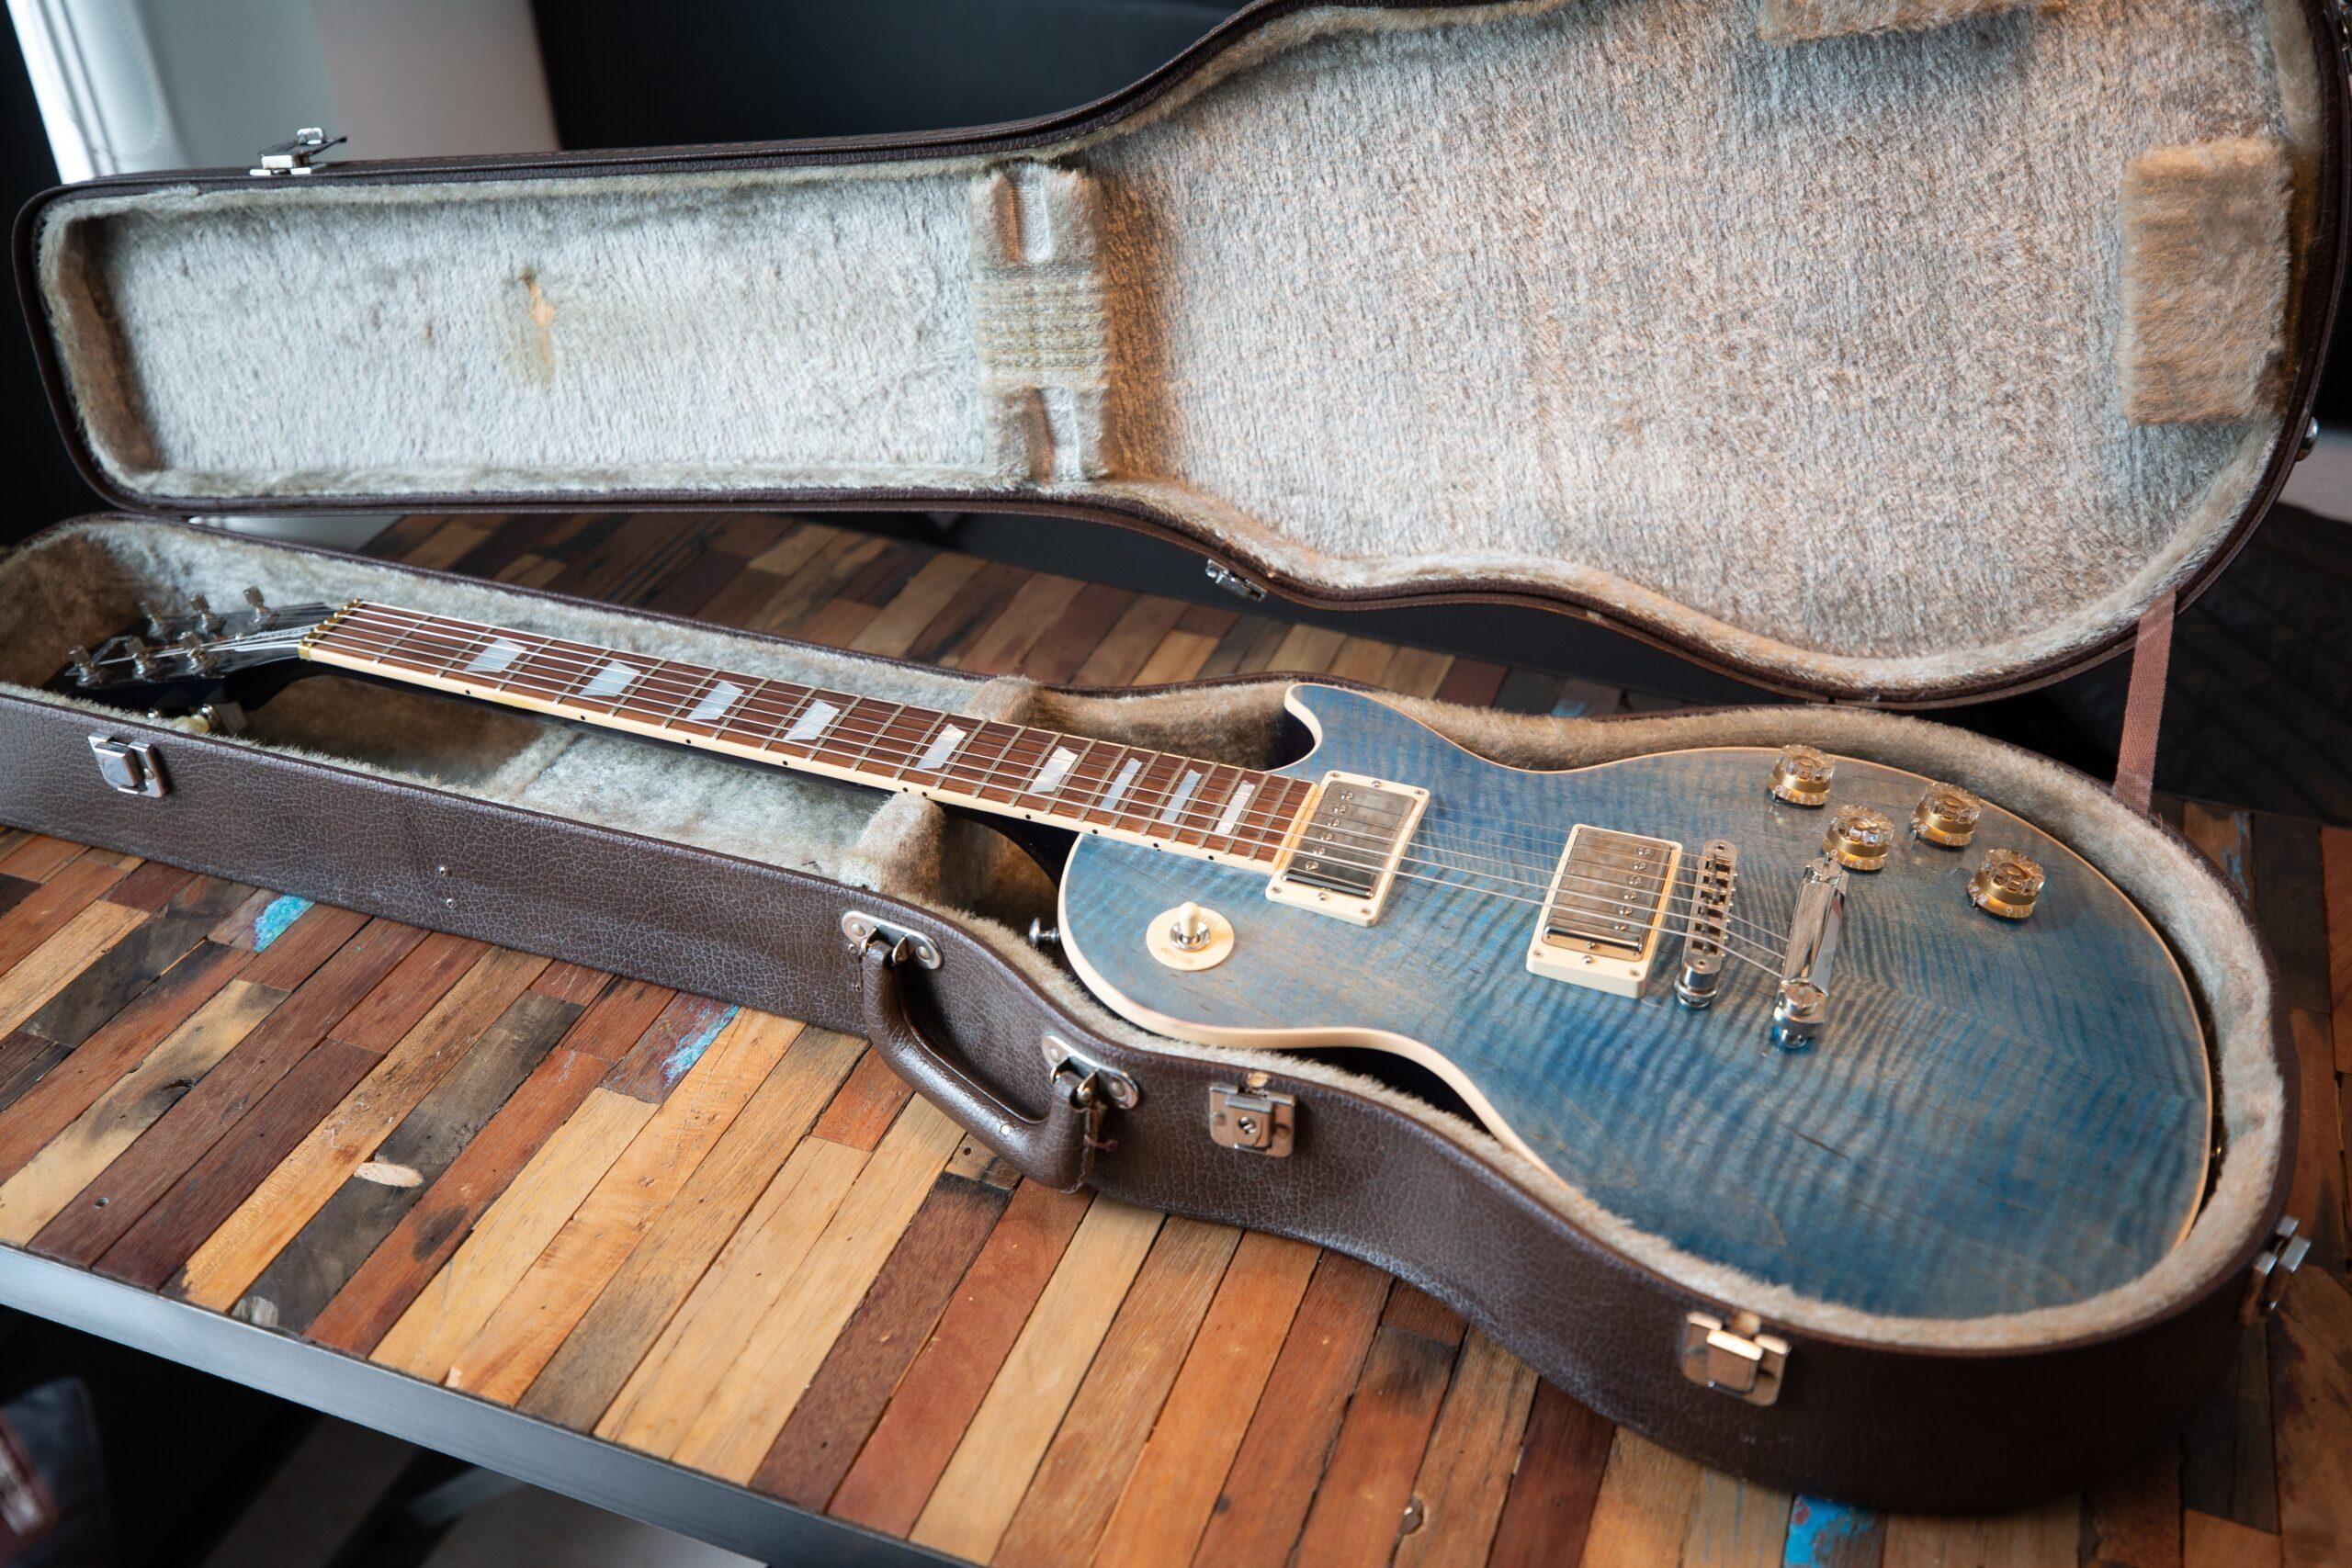 Blue Les Paul Electric Guitar | Understanding What Makes The Top 11 Types Of Guitar Unique